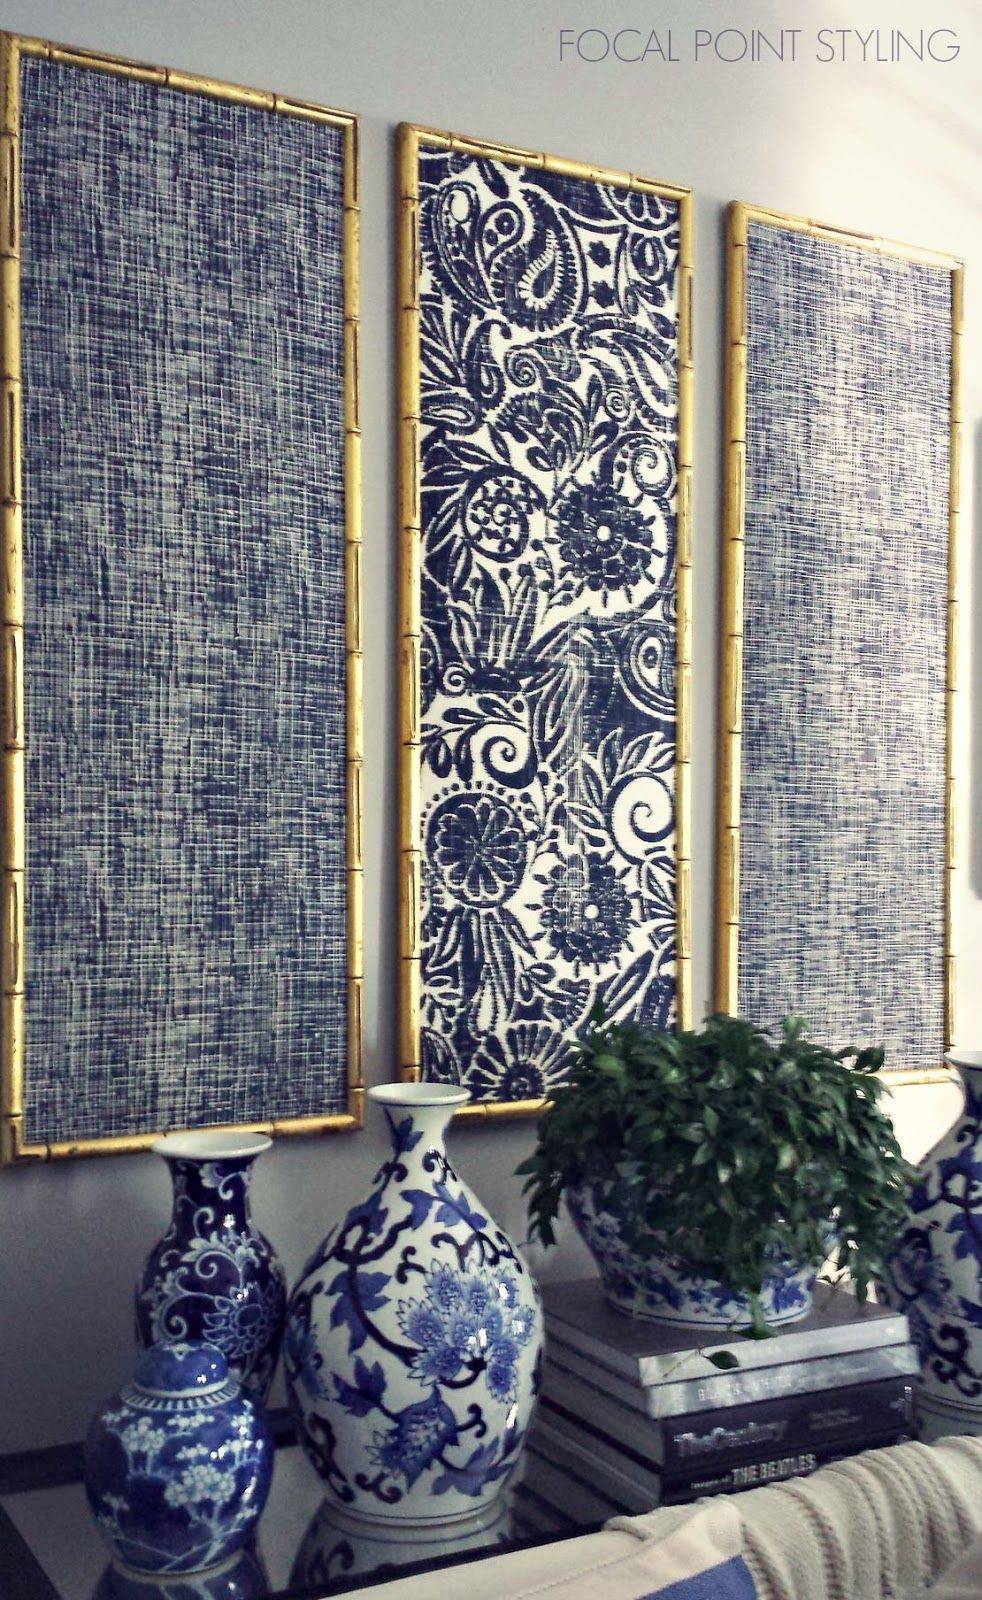 Diy Indigo Wall Art With Framed Fabric Diy Wall Art Decor Indigo Walls Wall Hanging Diy Projects